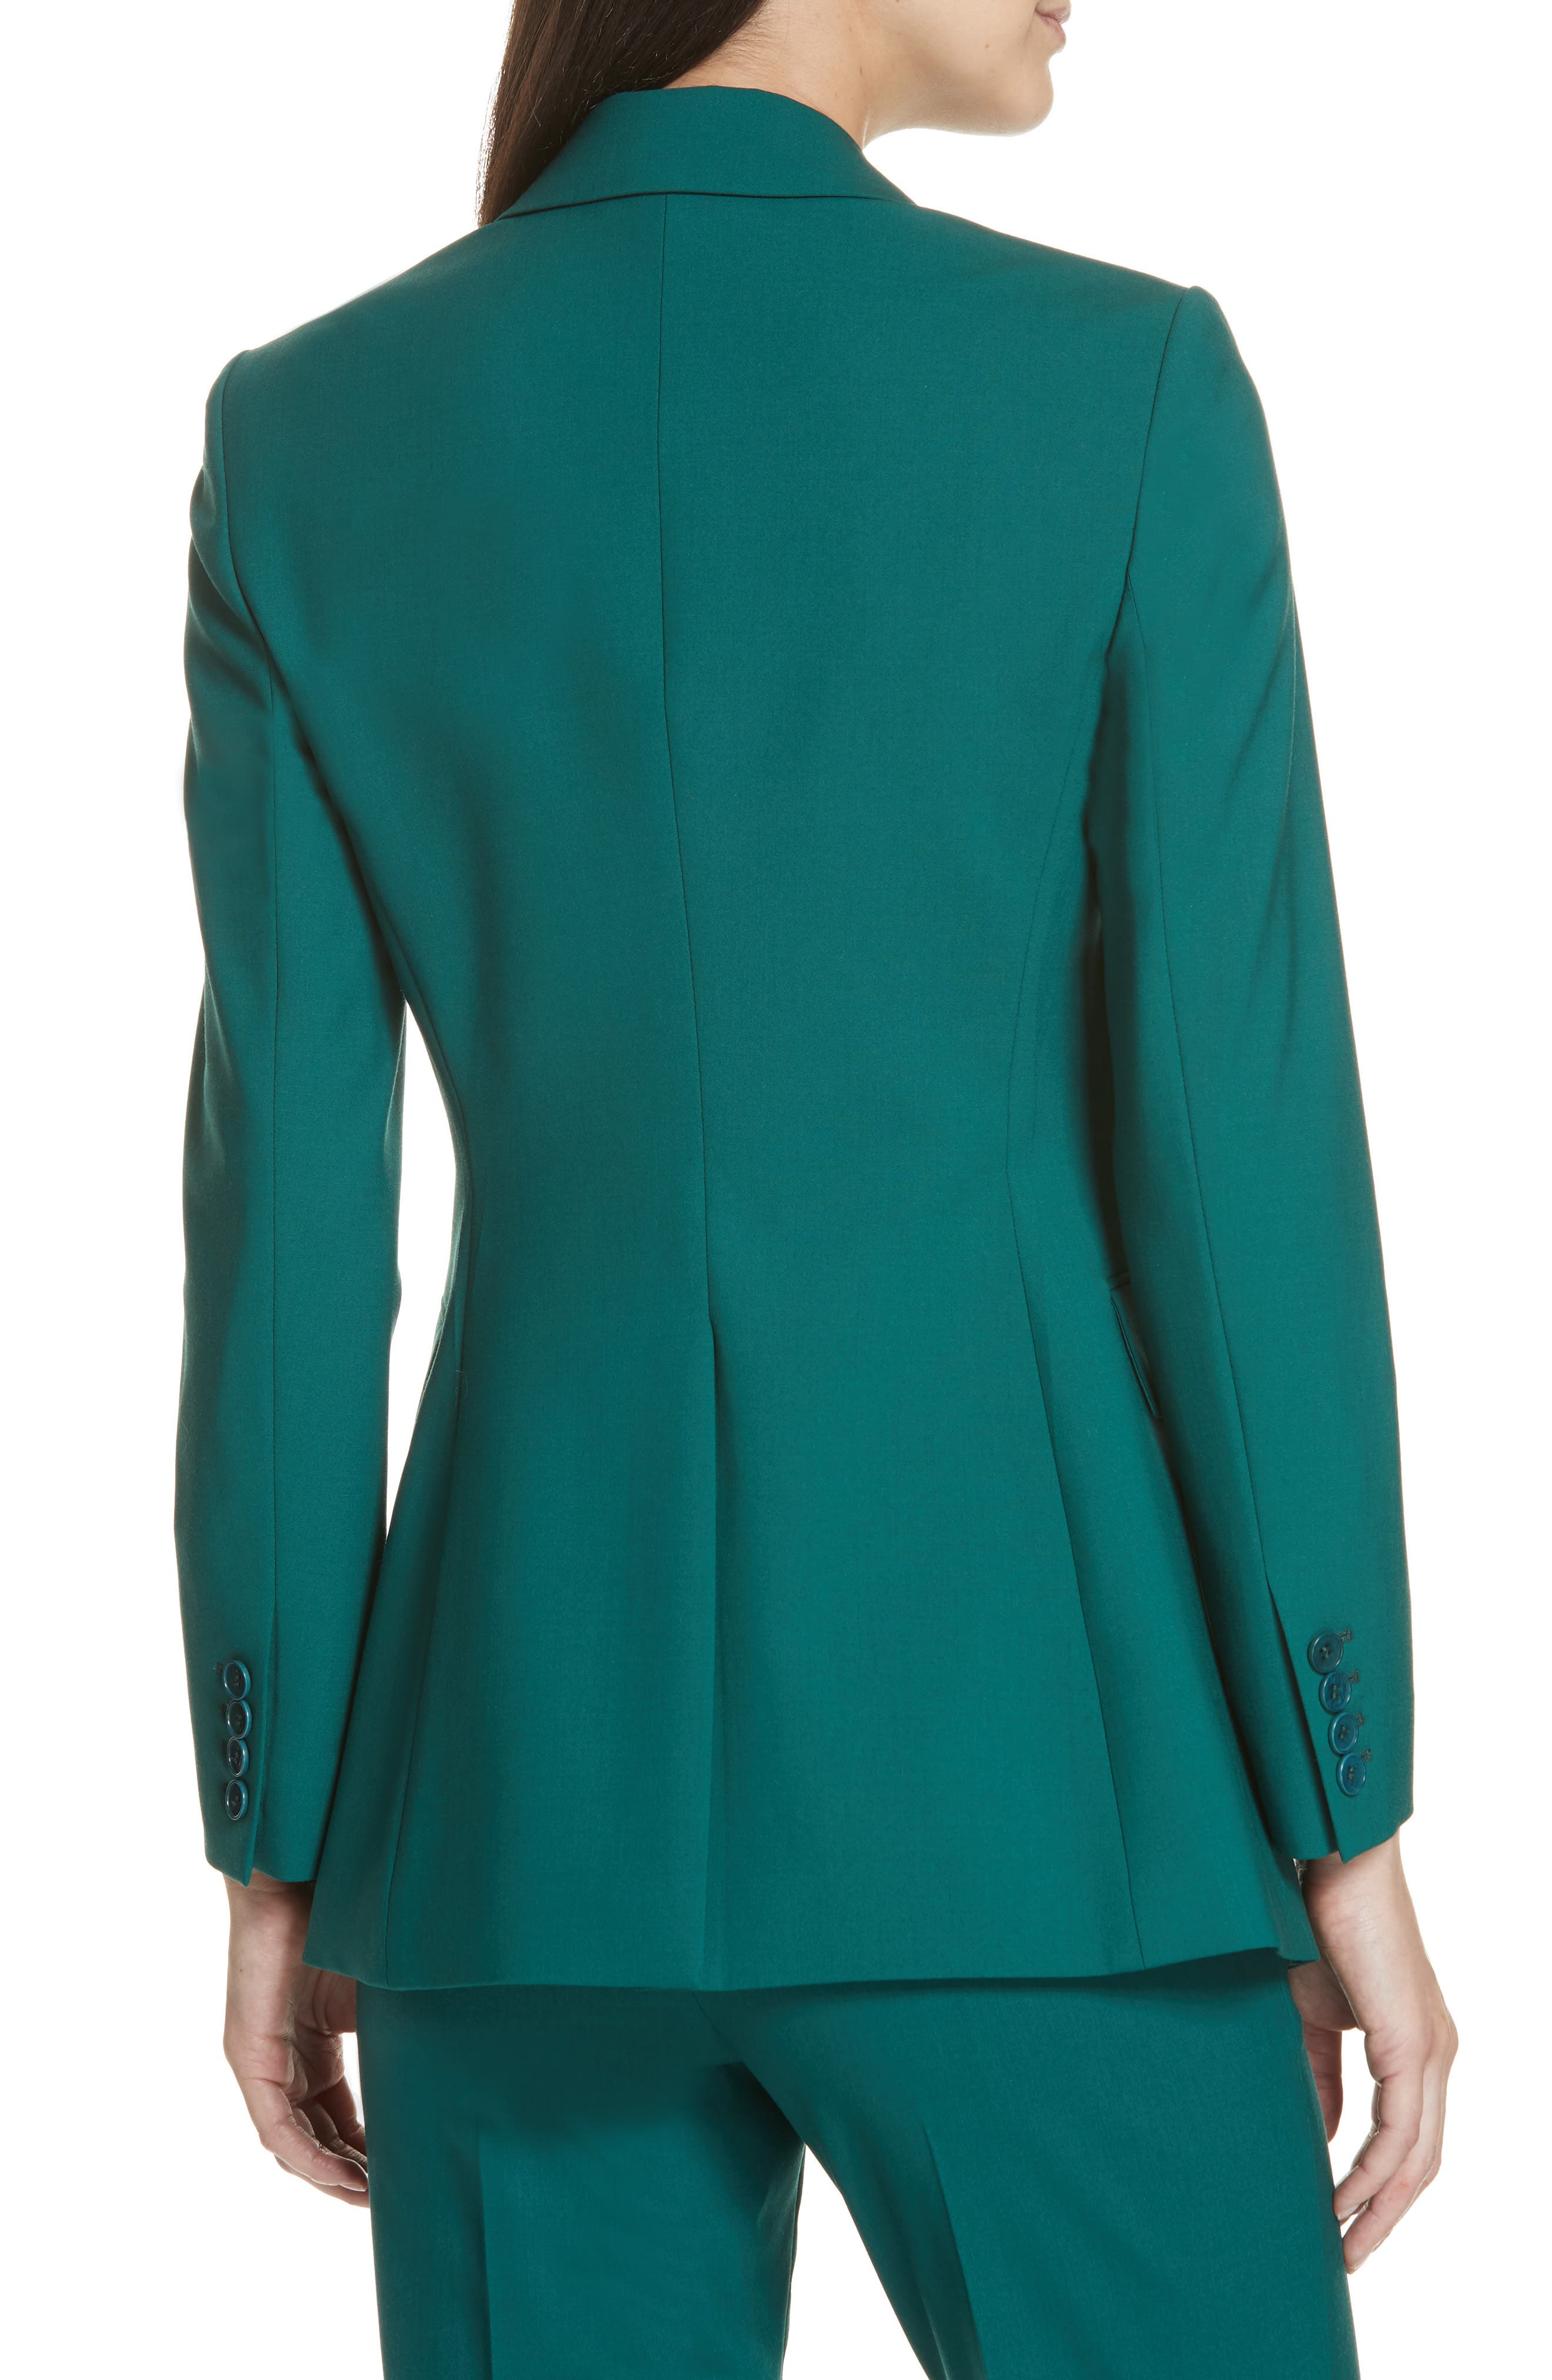 Etienette B Good Wool Suit Jacket,                             Alternate thumbnail 10, color,